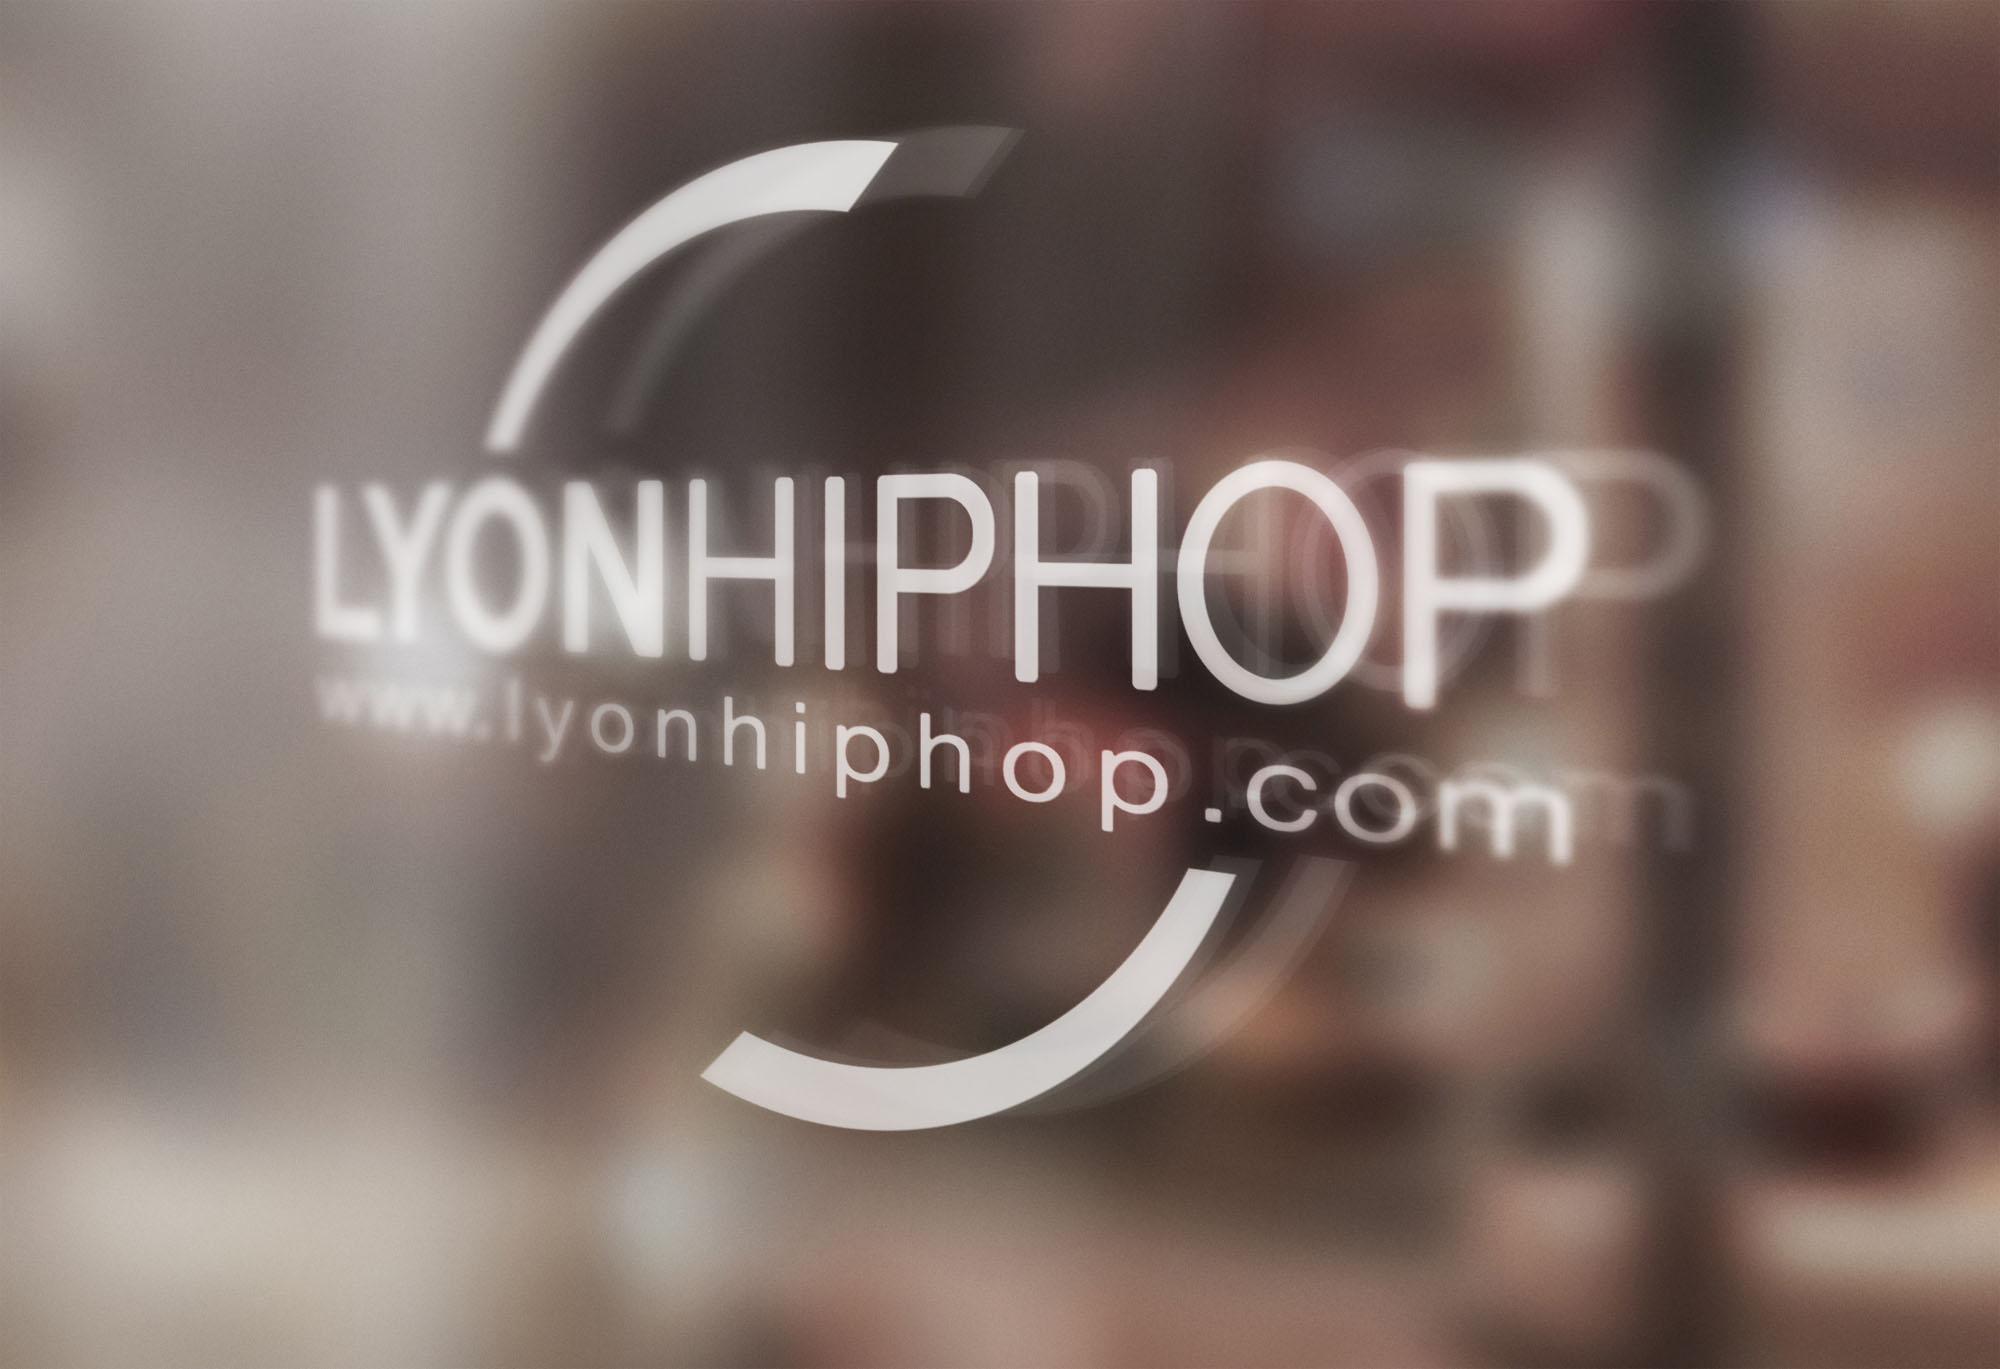 Lyon Hip Hop